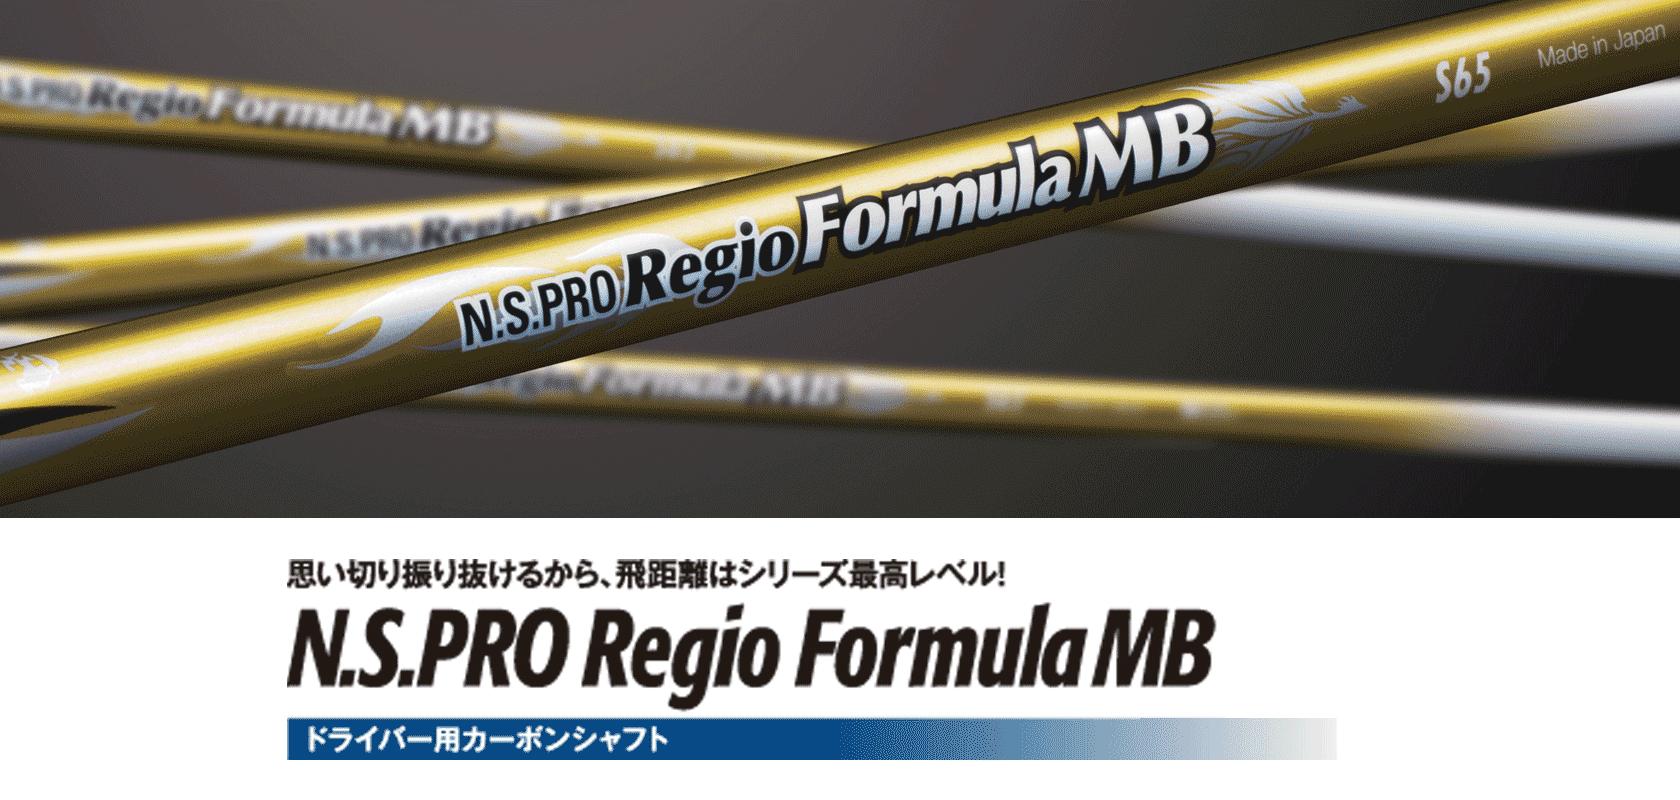 regio formula mbシリーズ 日本シャフト n s pro